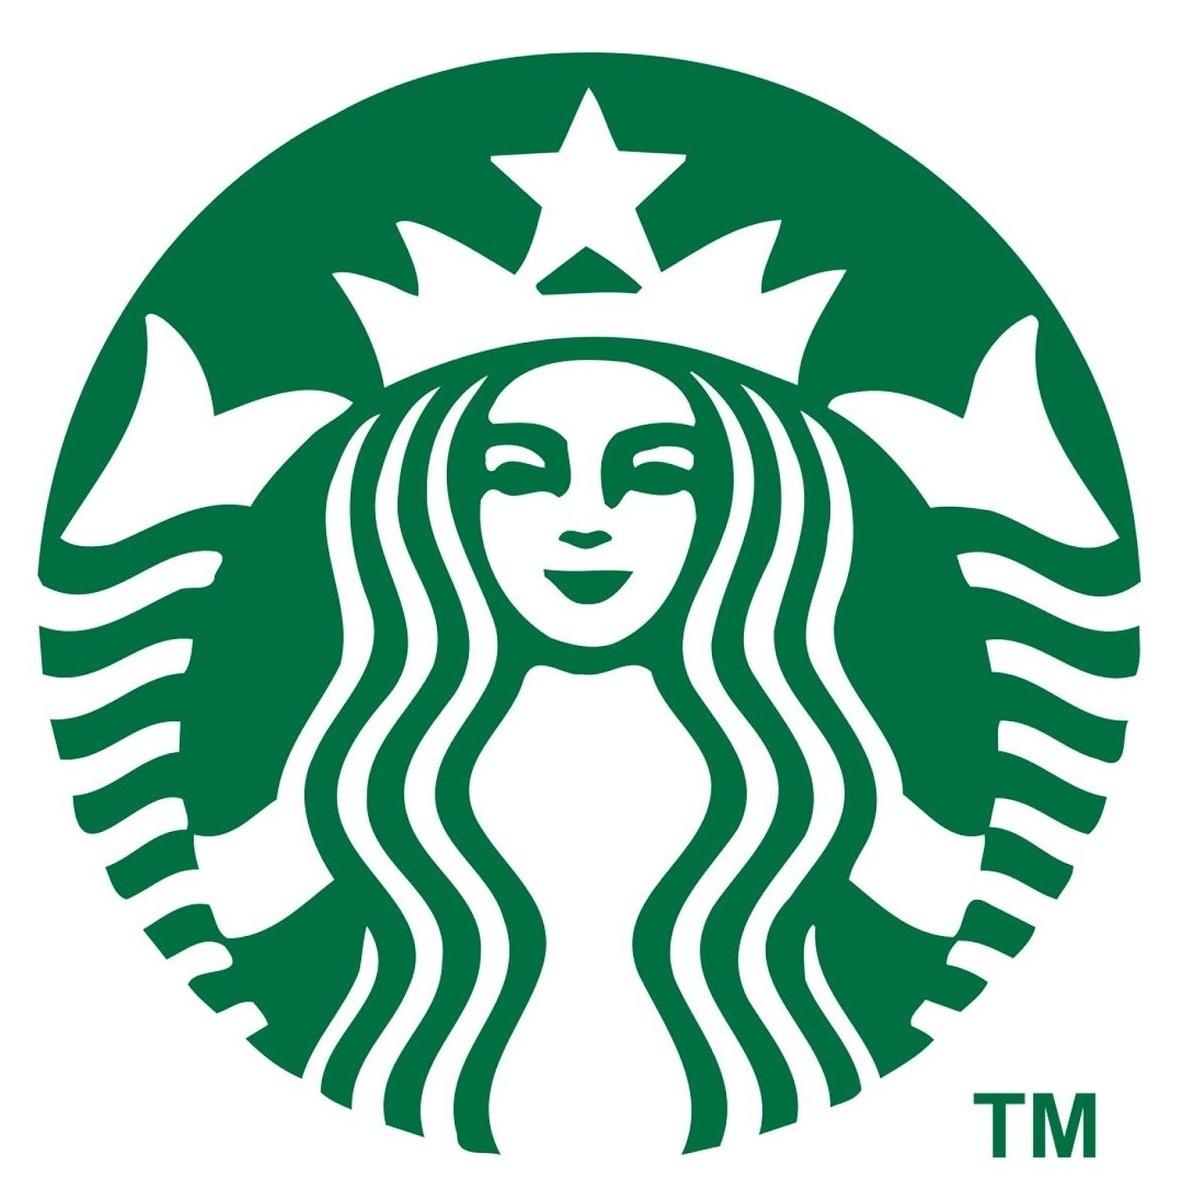 Starbucks Coupons - The Krazy Coupon Lady - Free Starbucks Coupon Printable